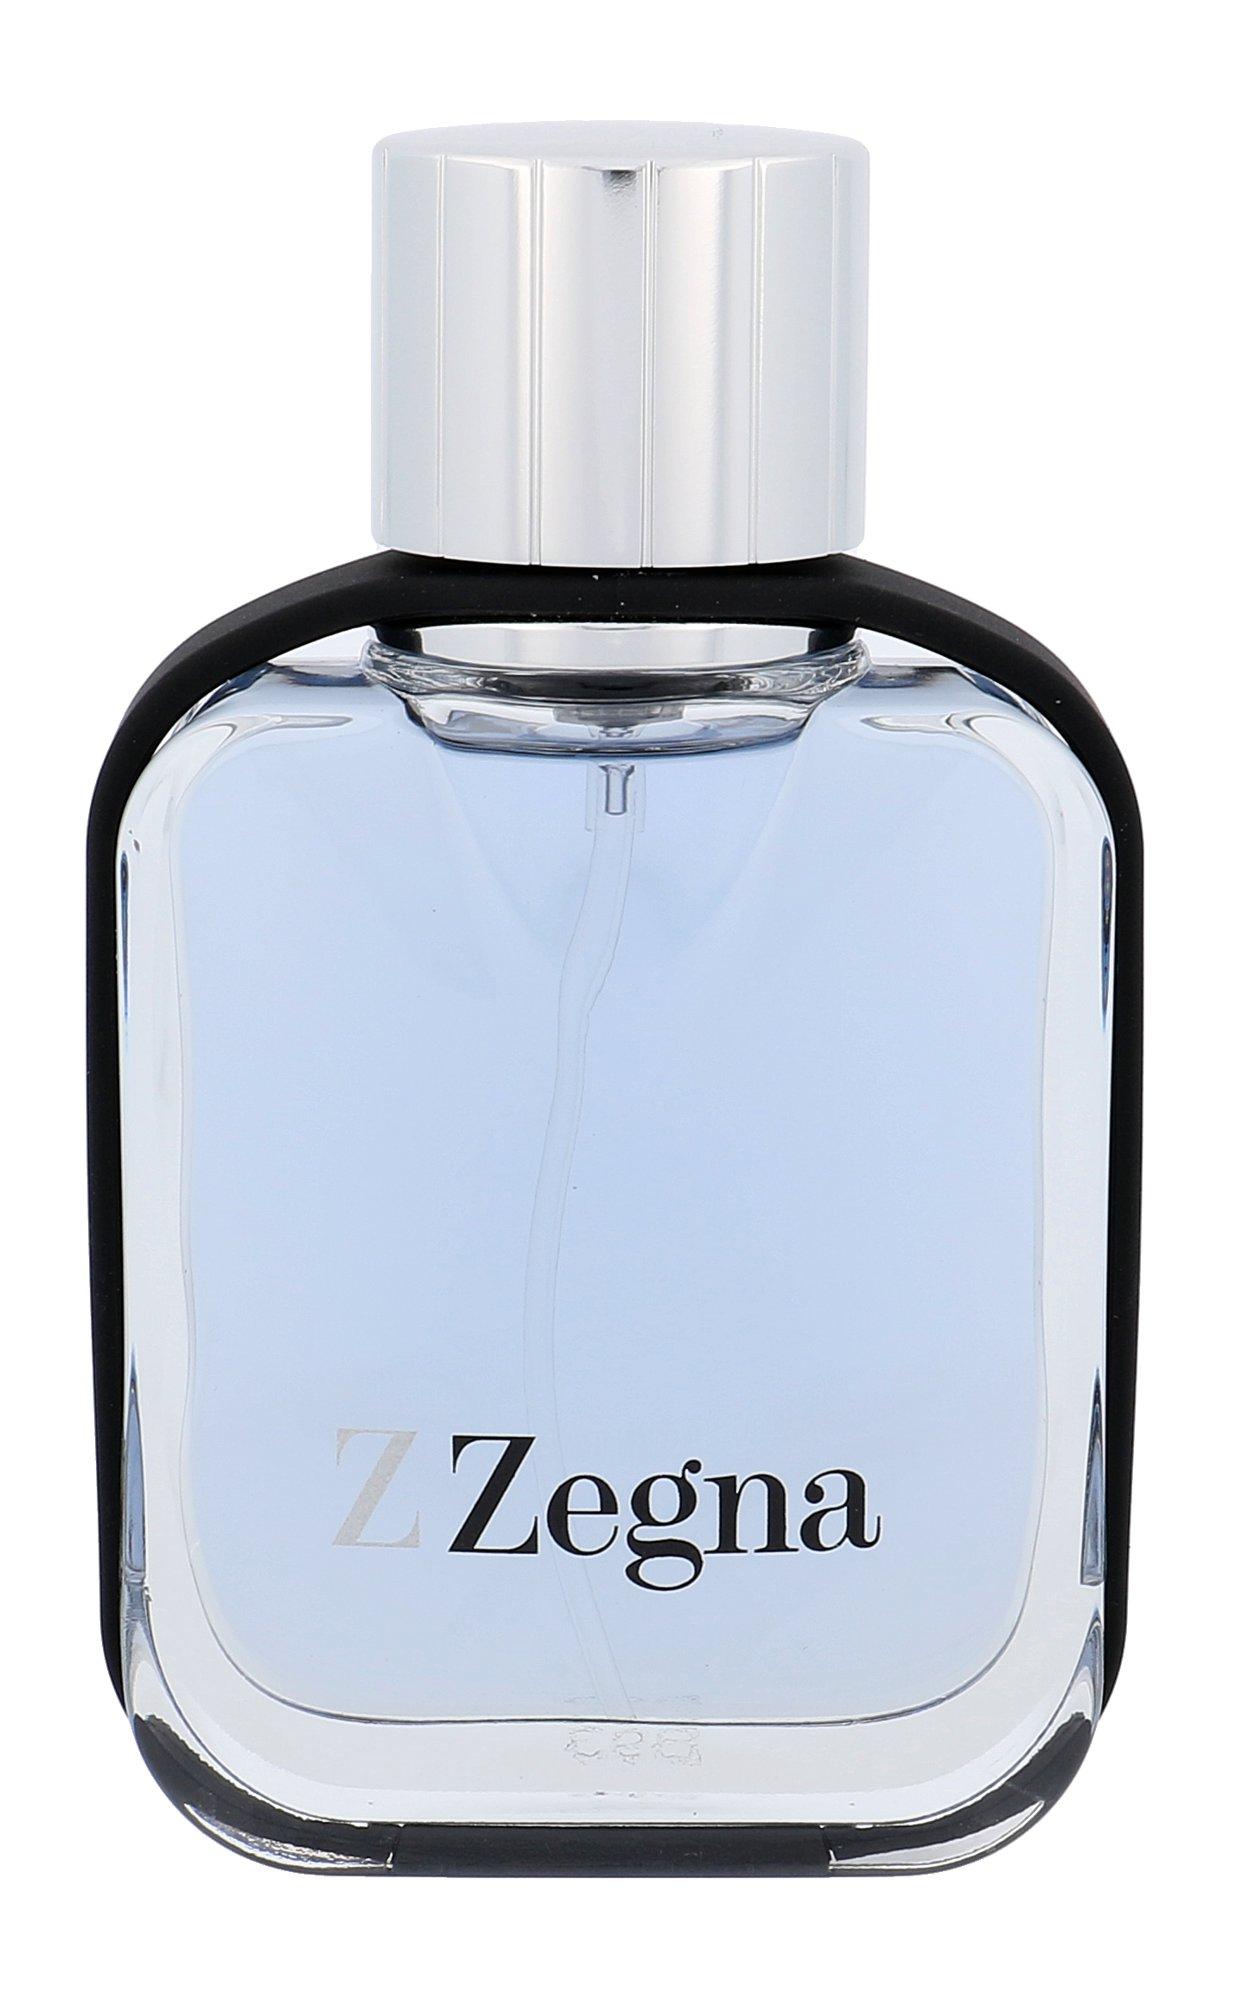 Ermenegildo Zegna Z Zegna, Toaletná voda 50ml